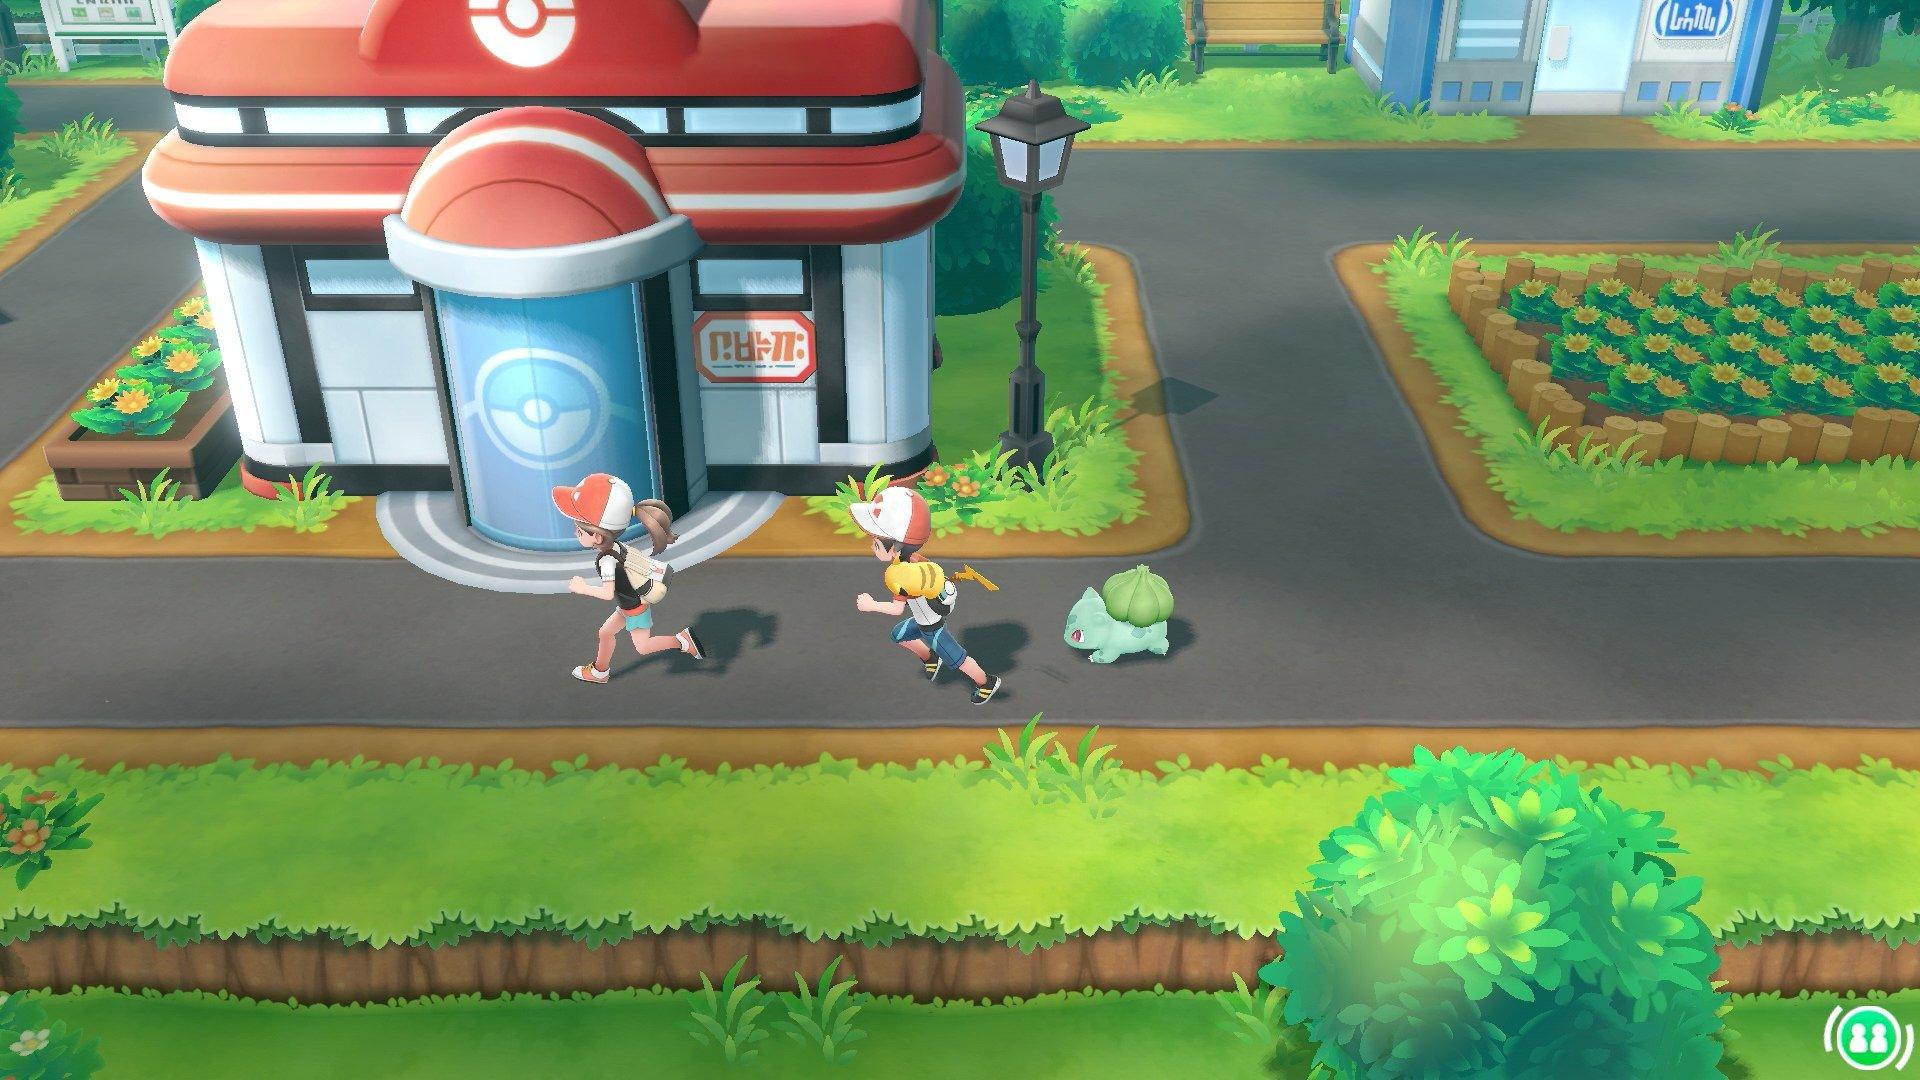 pok_mon_rpg__6nintendo-switch_frikigamers.com